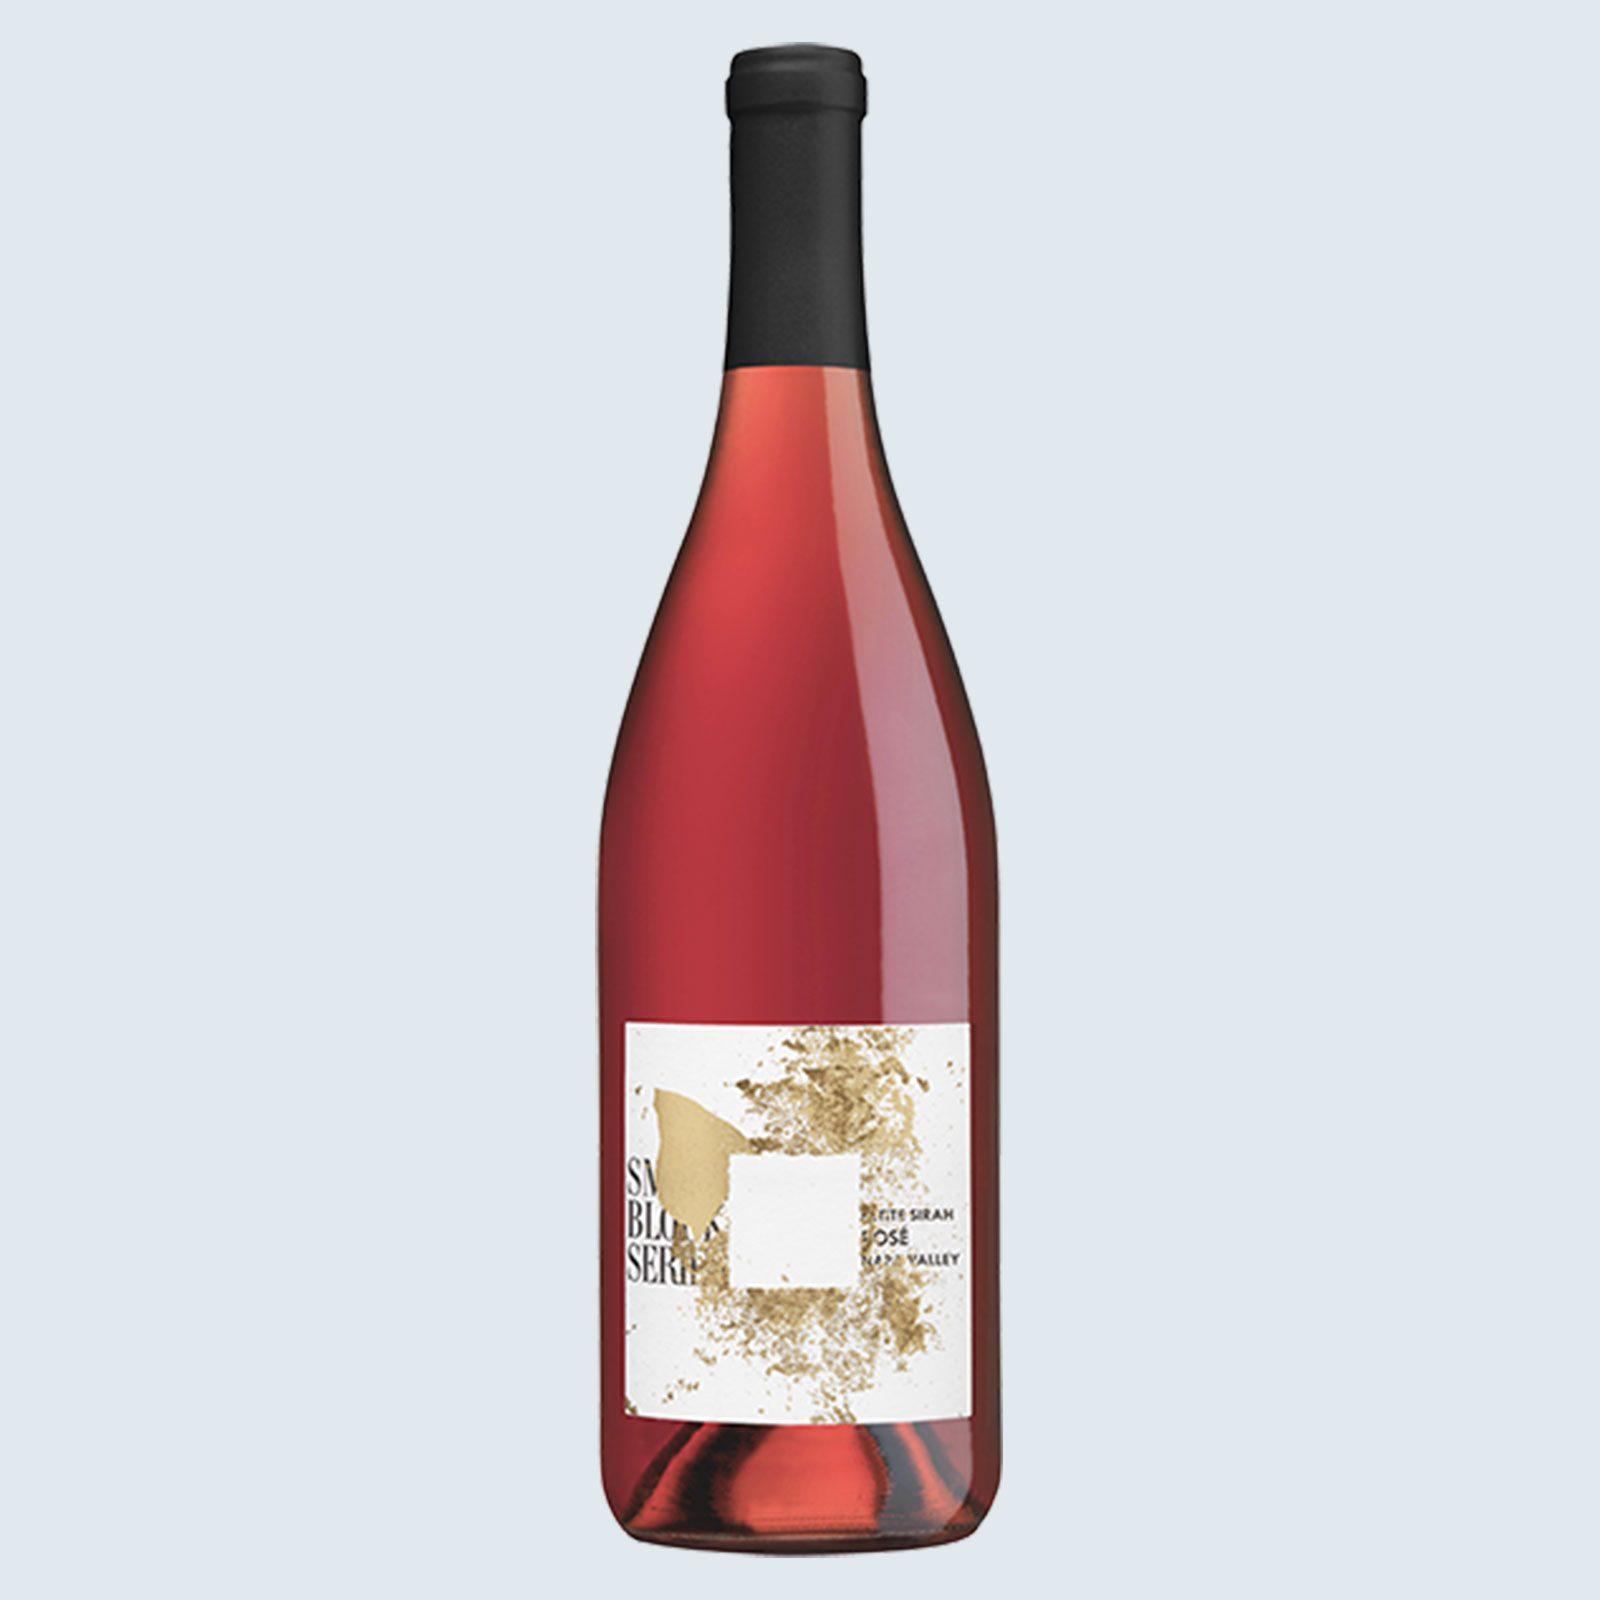 Napa Valley Petite Sirah Rosé 2019